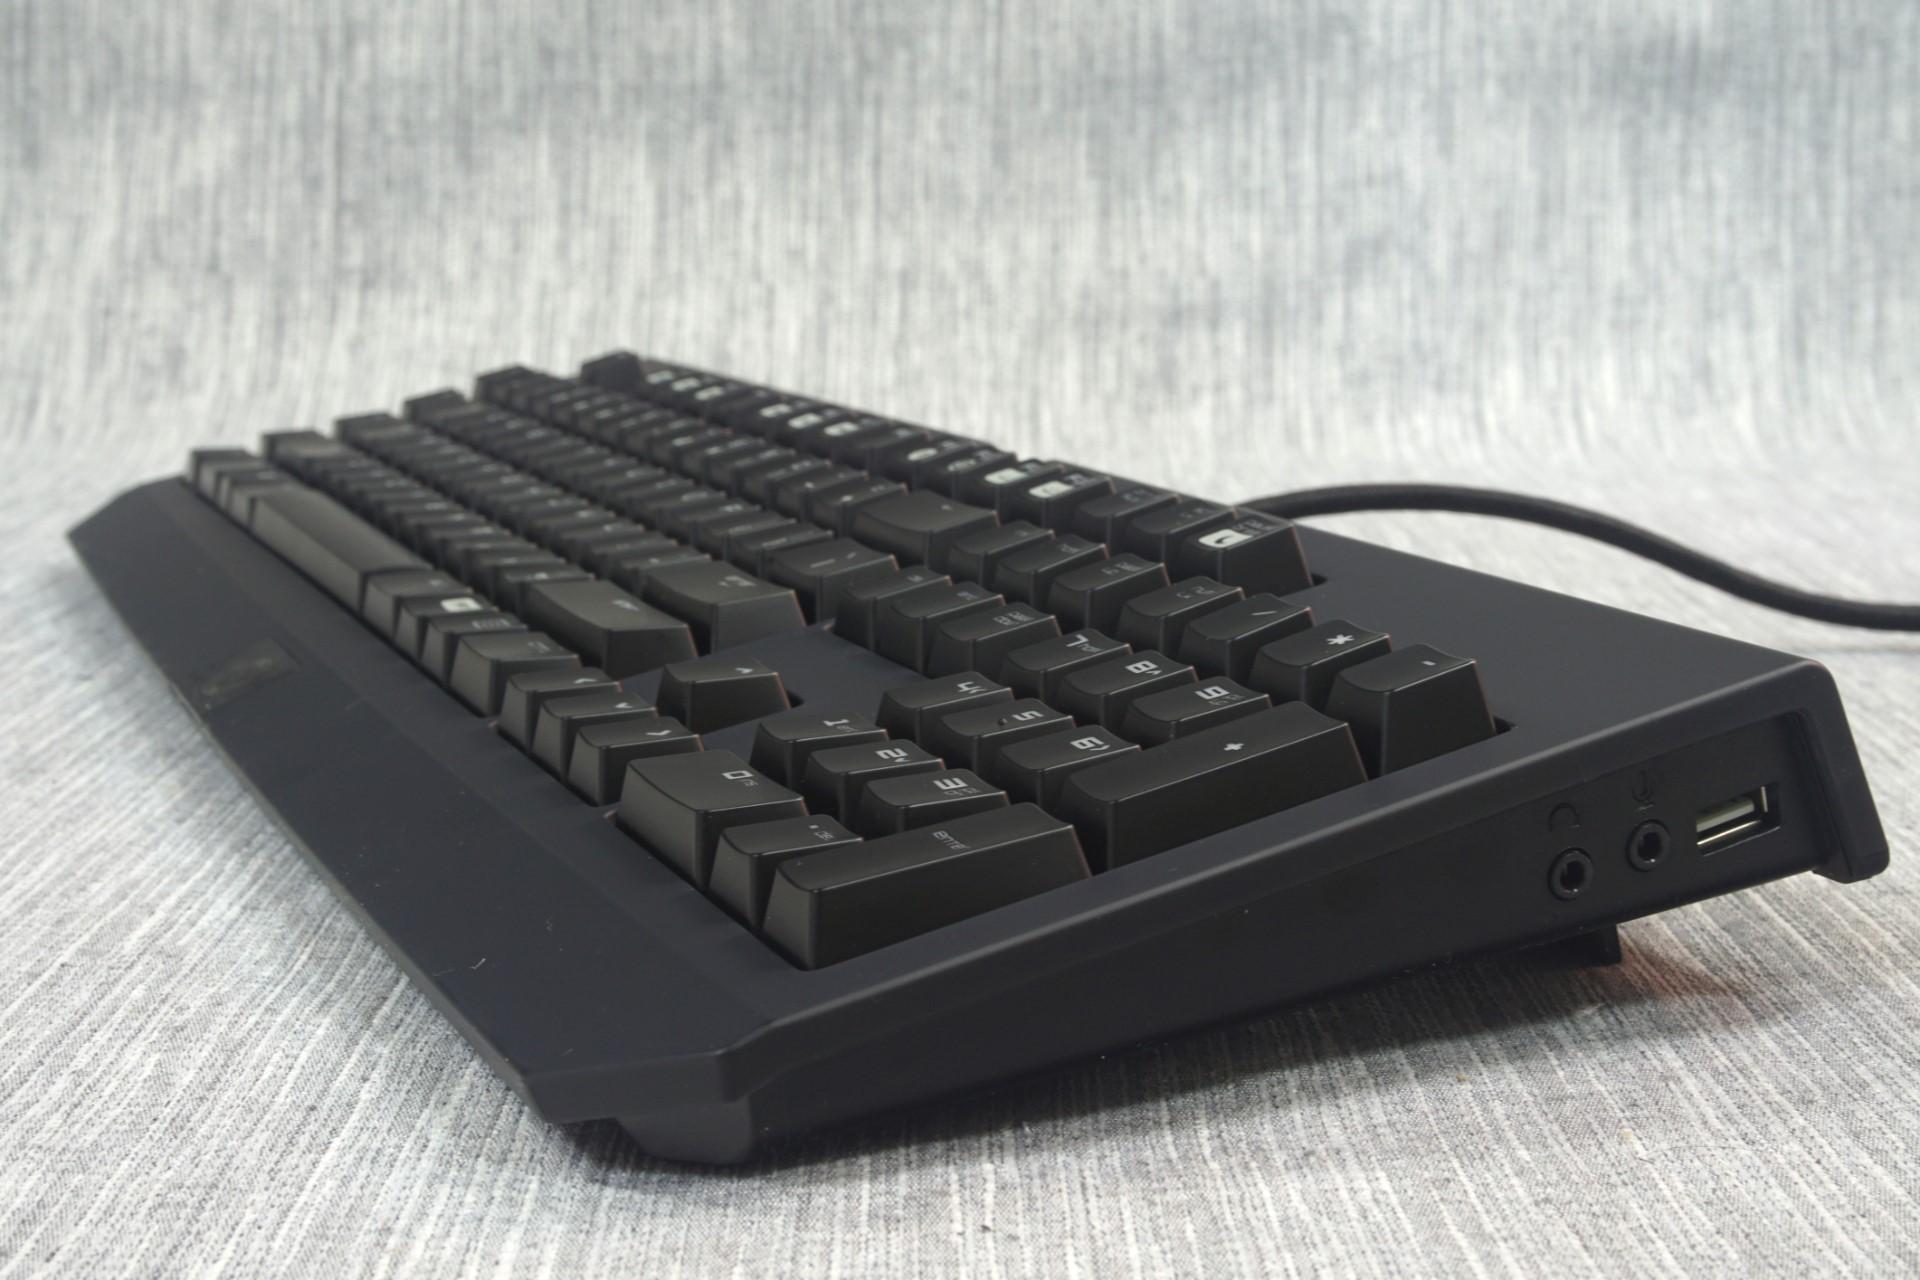 The ORIGIN PC BlackWidow Chroma Mechanical Gaming Keyboard